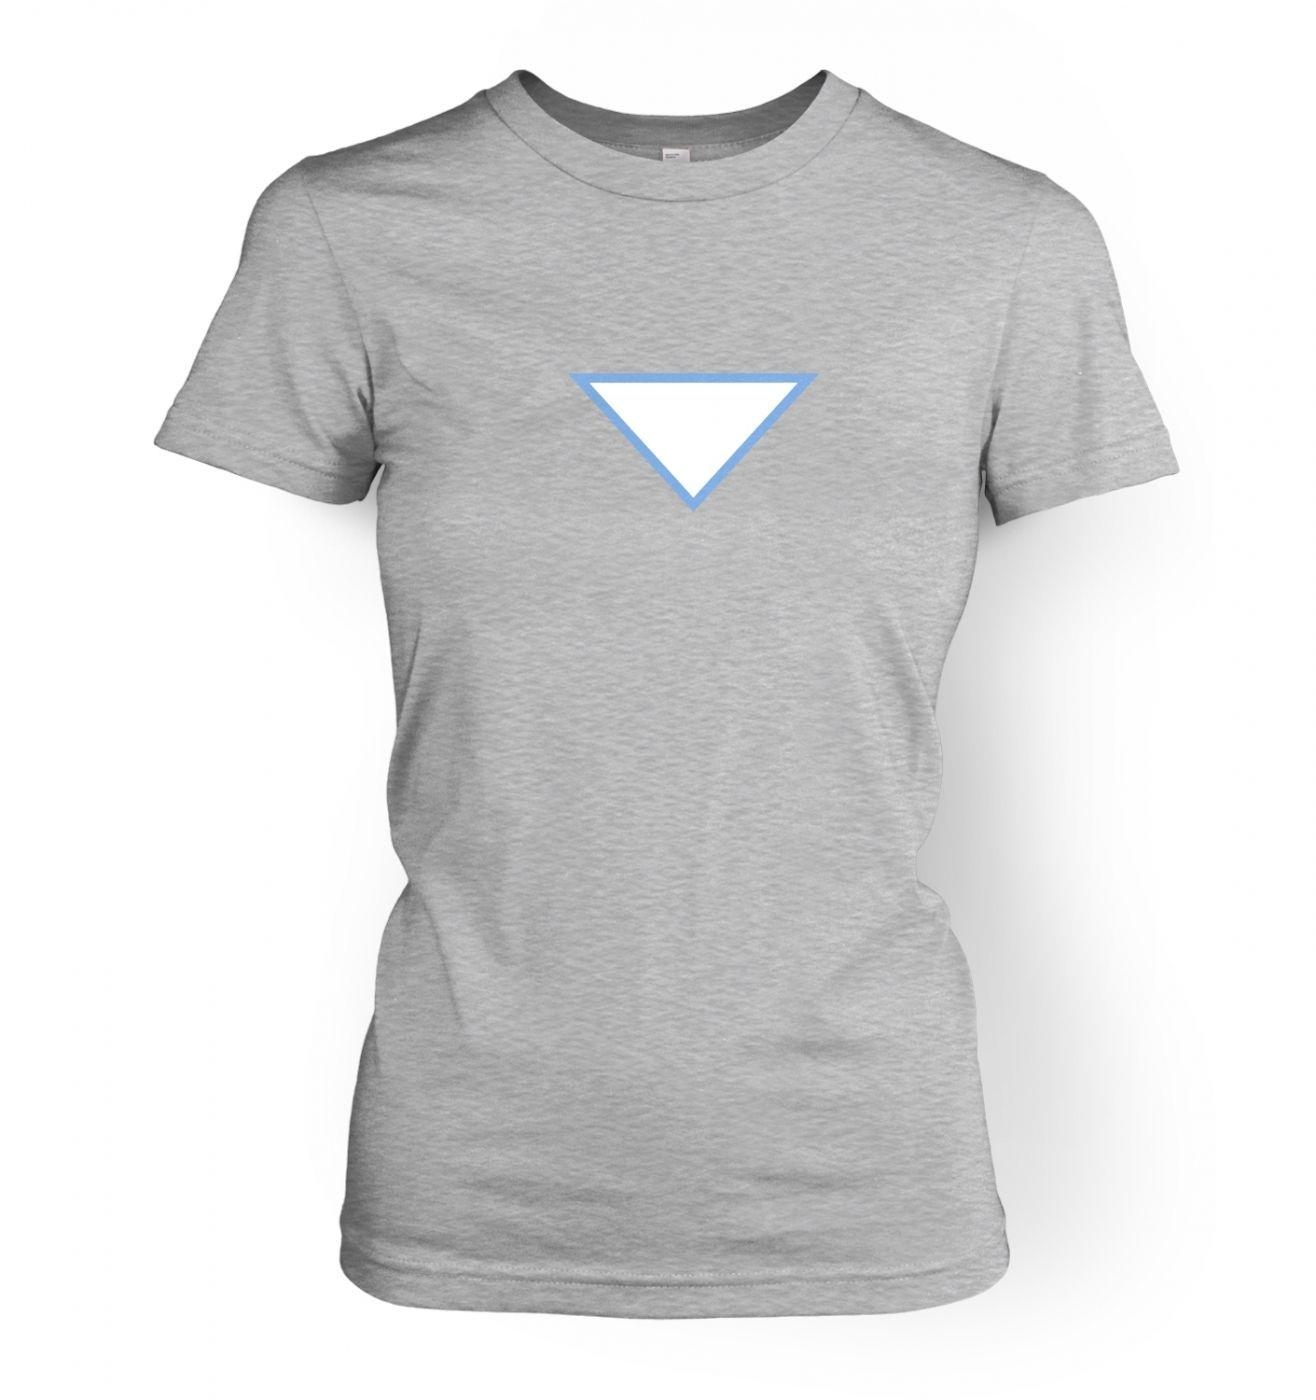 Triangular Power Cell women's fitted t-shirt